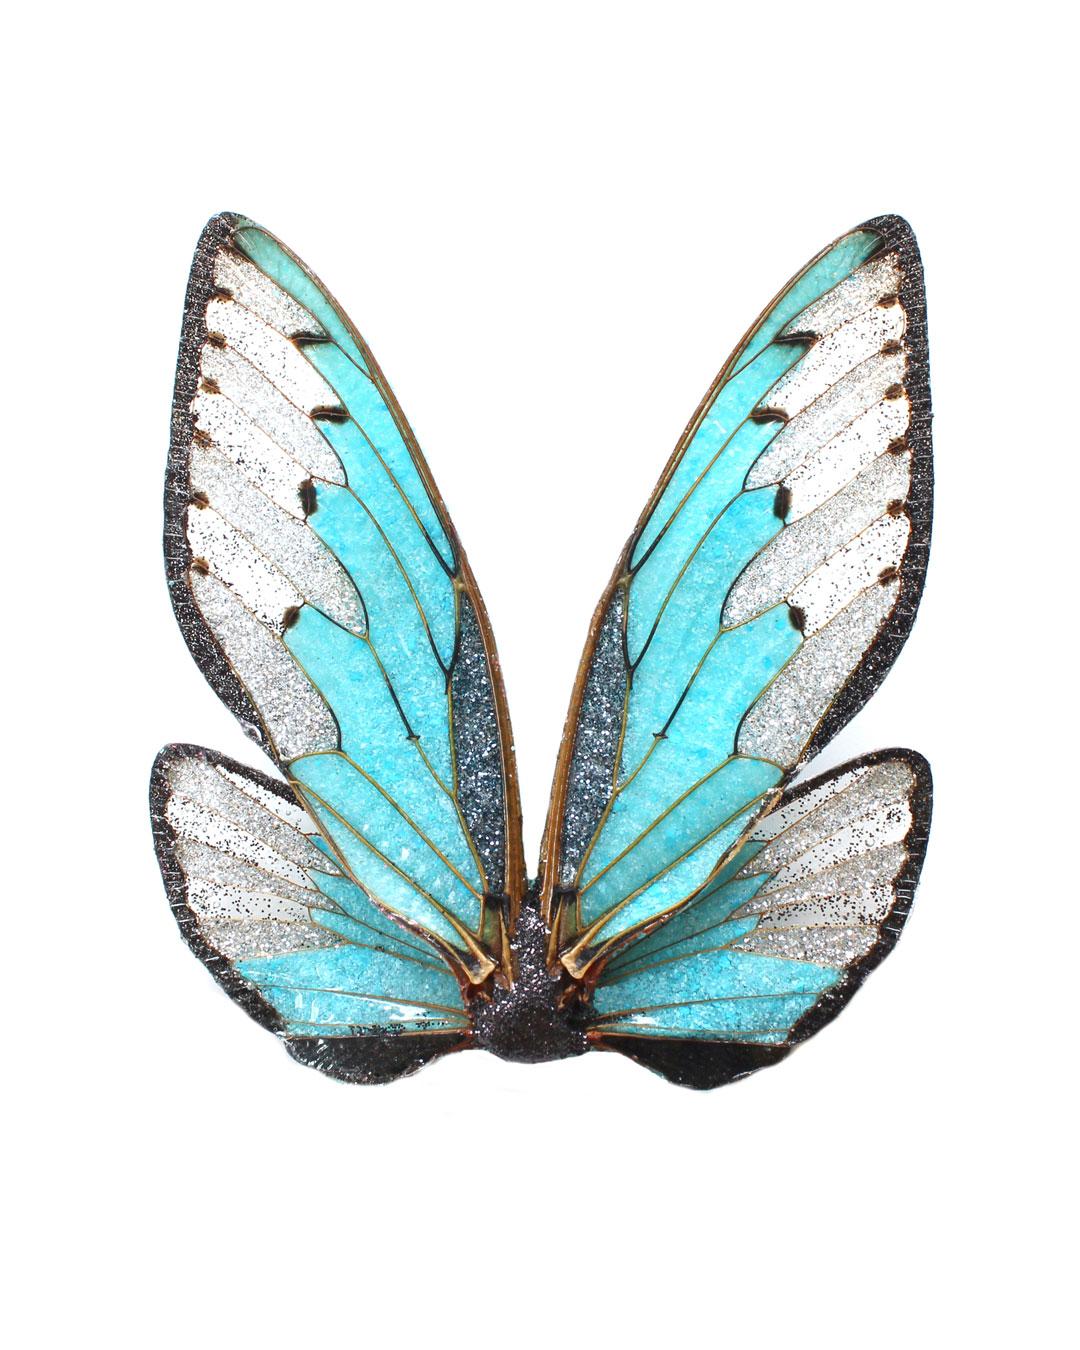 Märta Mattsson, Wings, 2016, broche; cicade, hars, pigment, zilver, 100 x 80 x 20 mm, €970